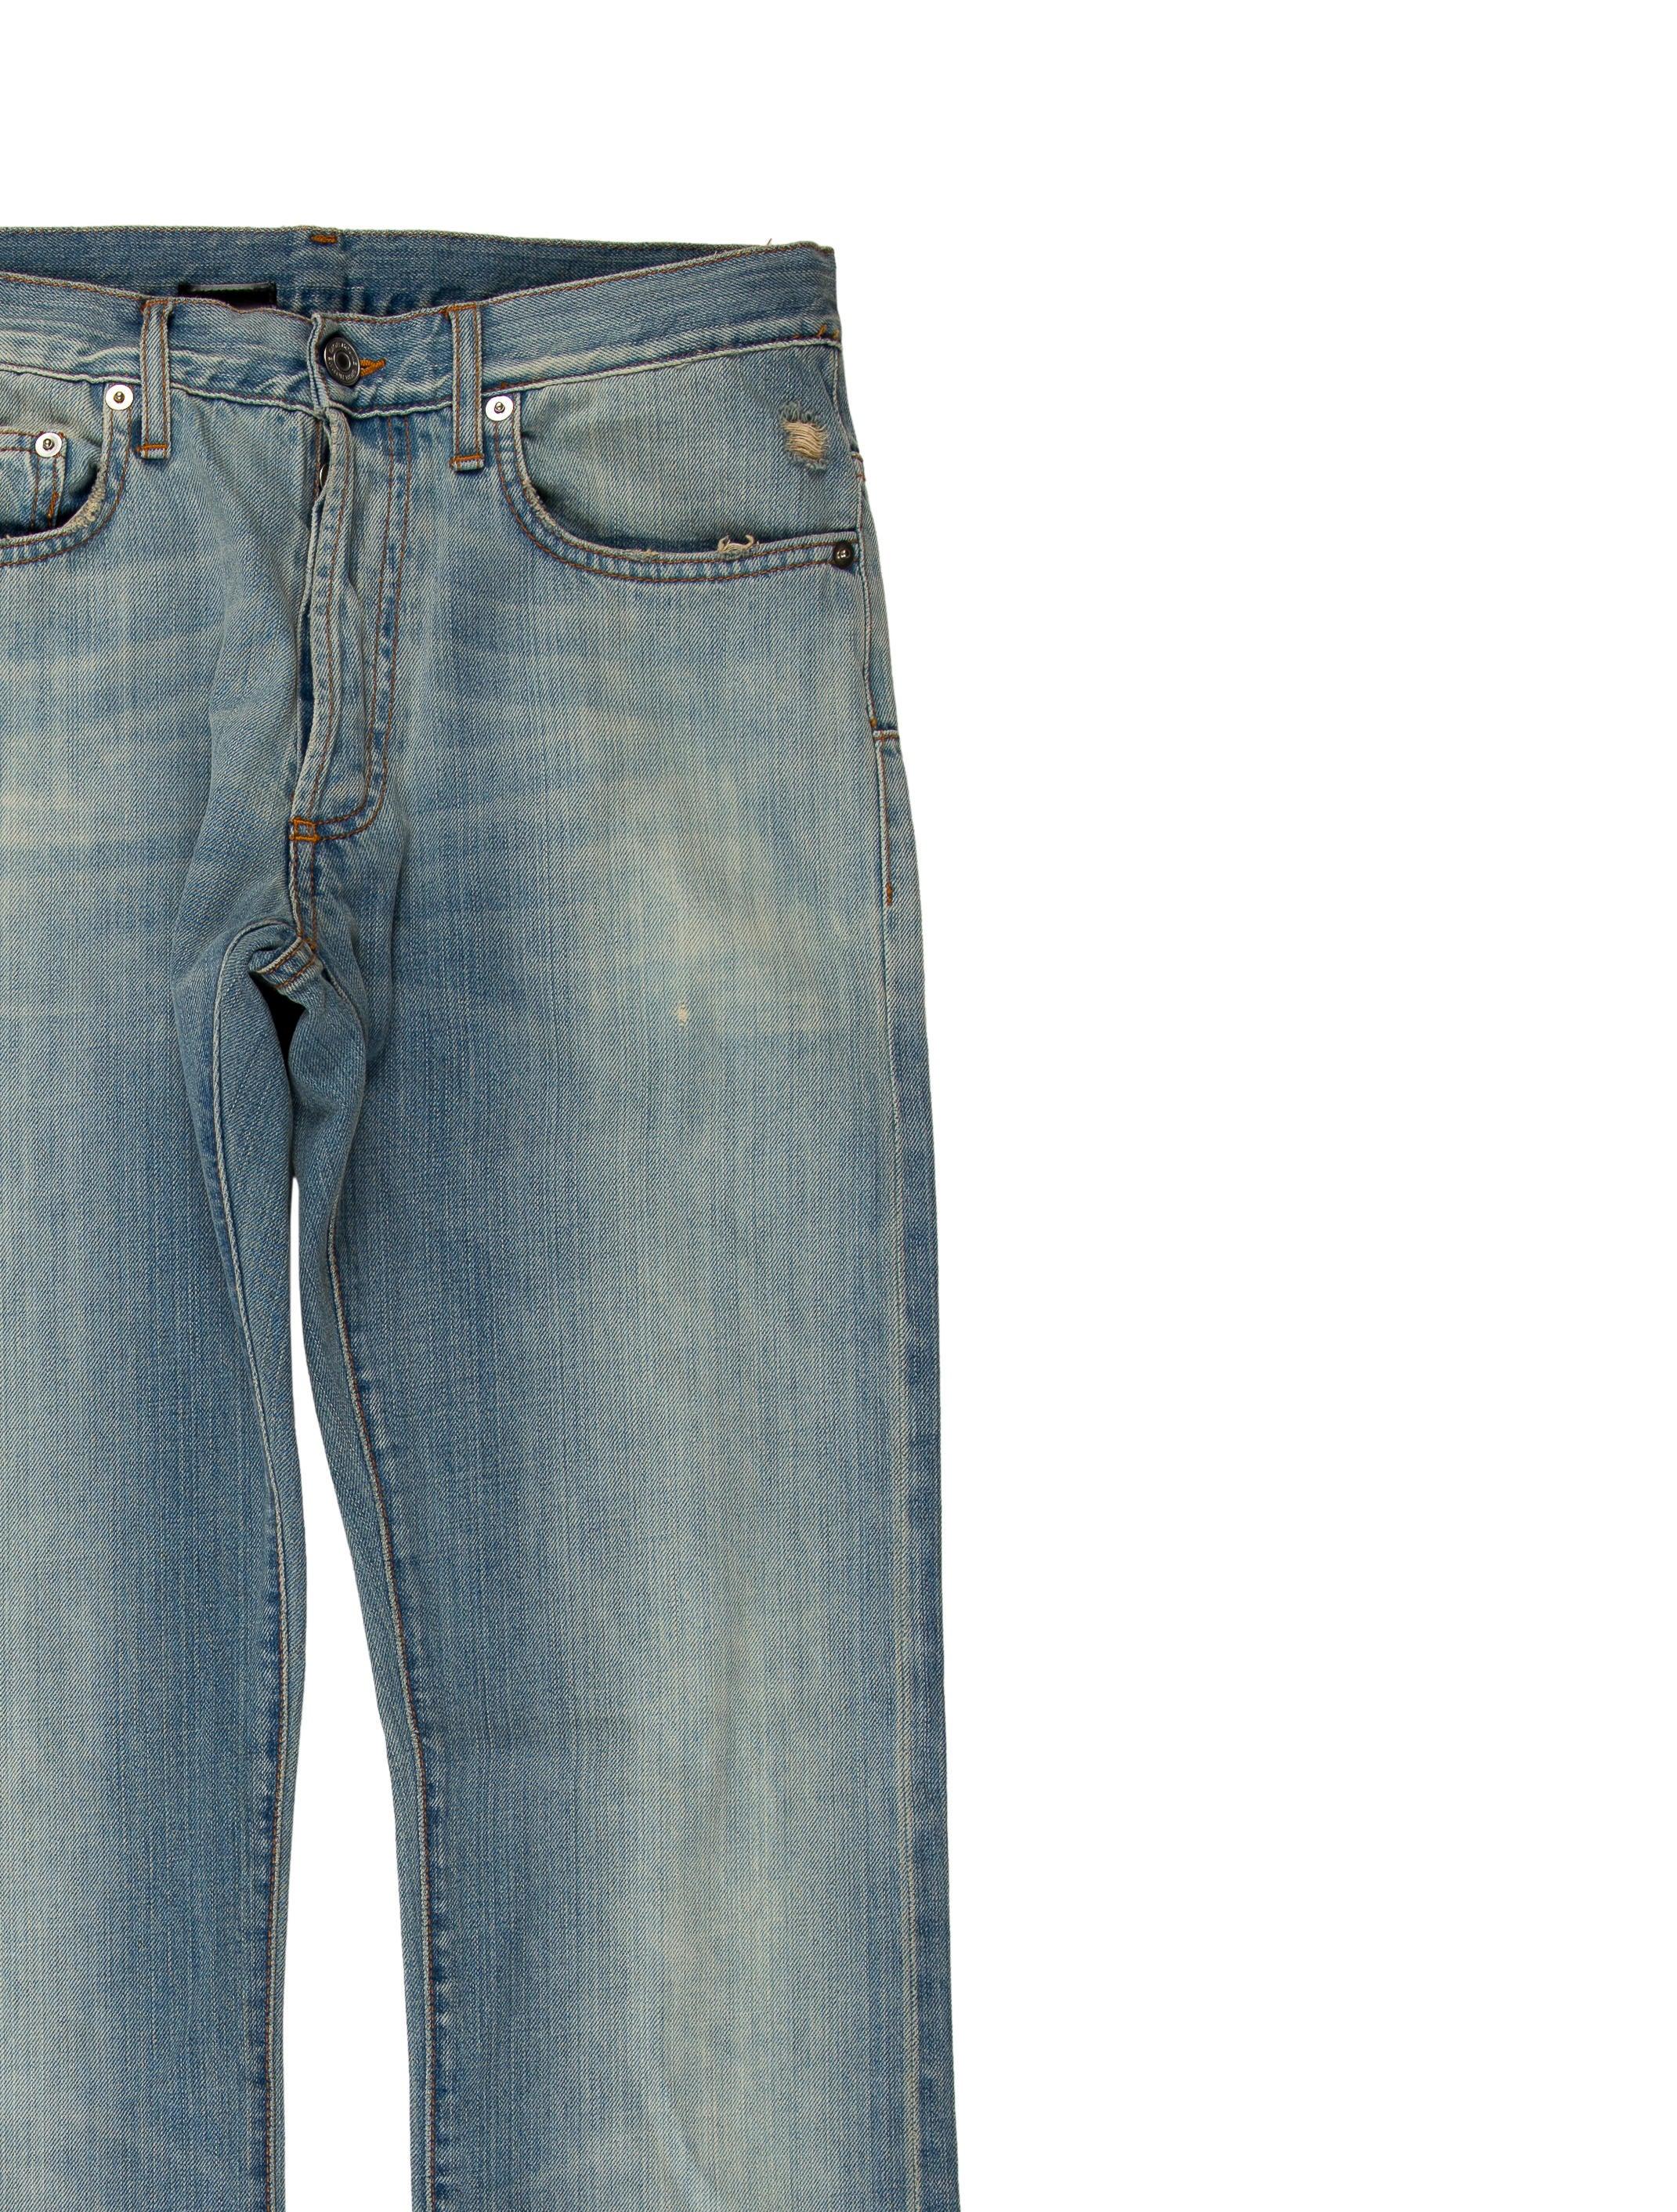 dior homme distressed slim fit jeans clothing hmm23413 the realreal. Black Bedroom Furniture Sets. Home Design Ideas